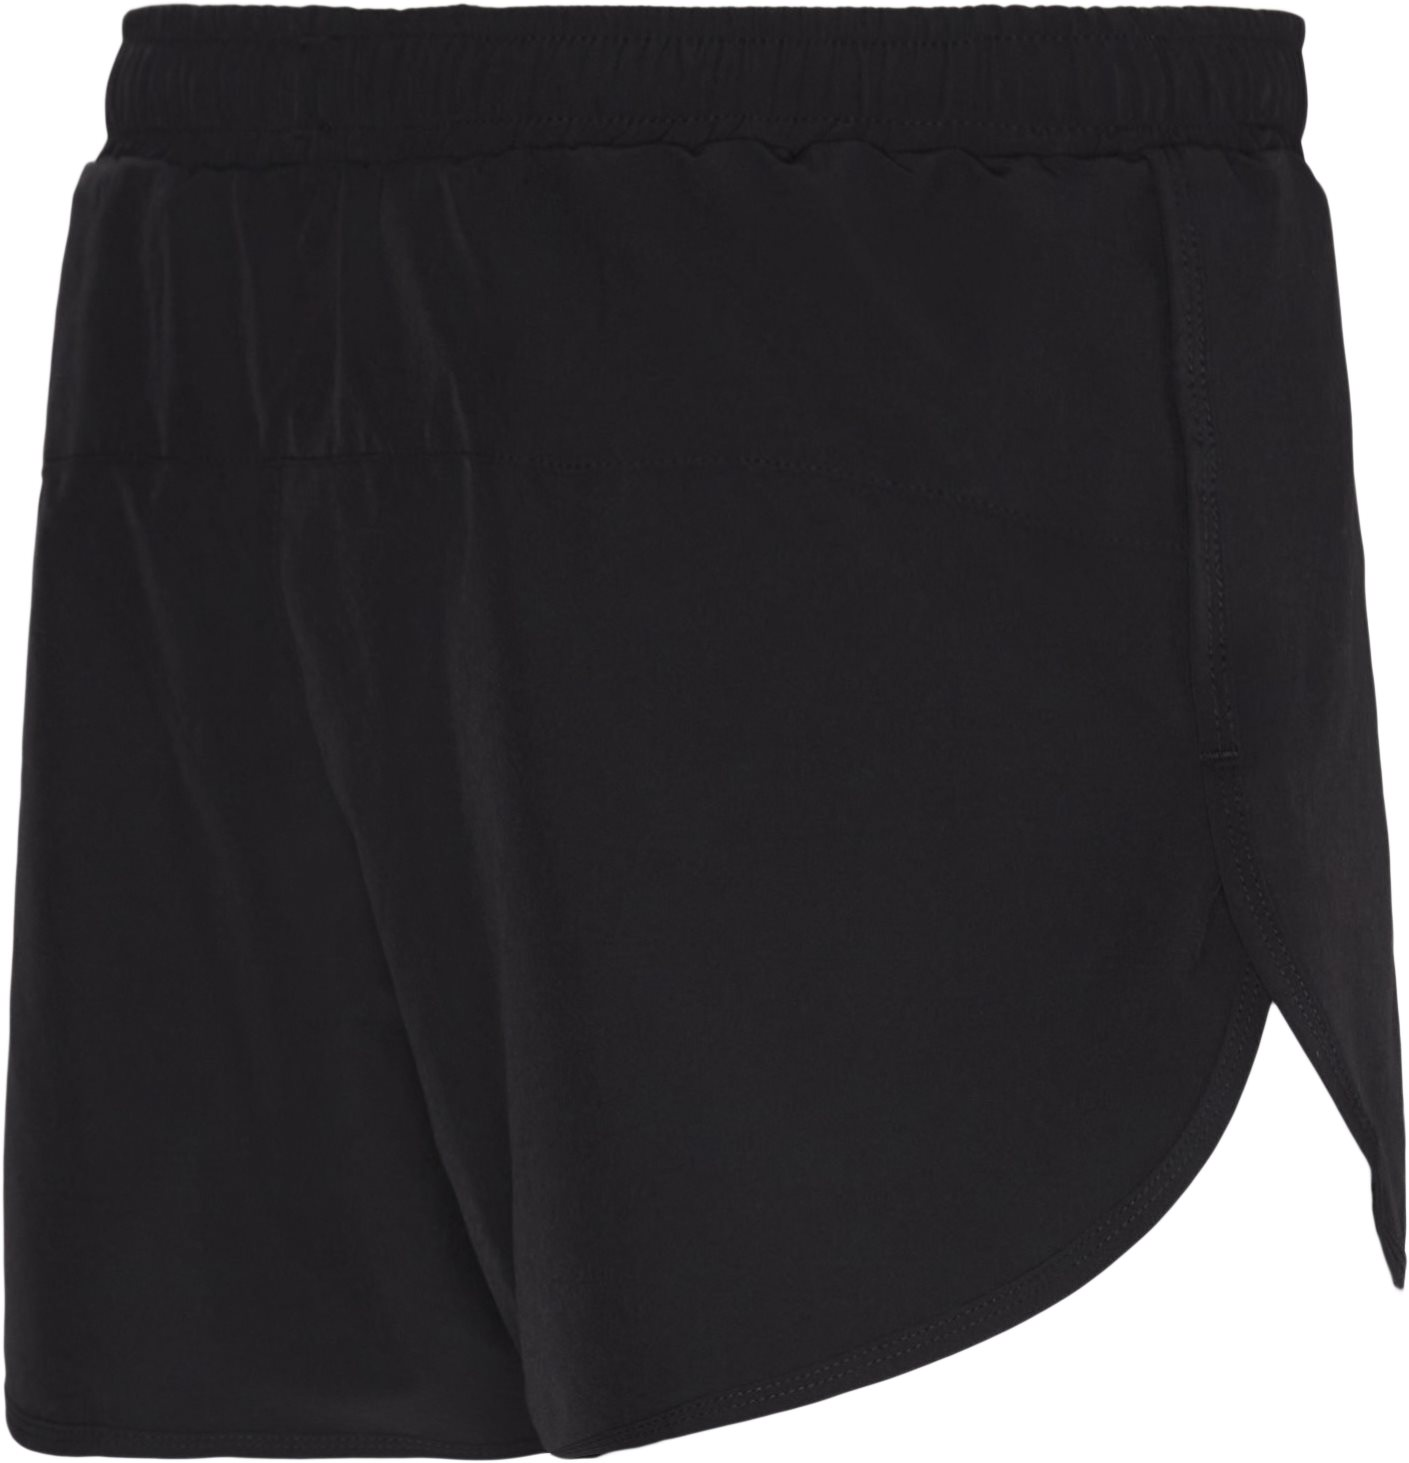 Quint Running Crew Skip Shorts - Shorts - Regular fit - Svart